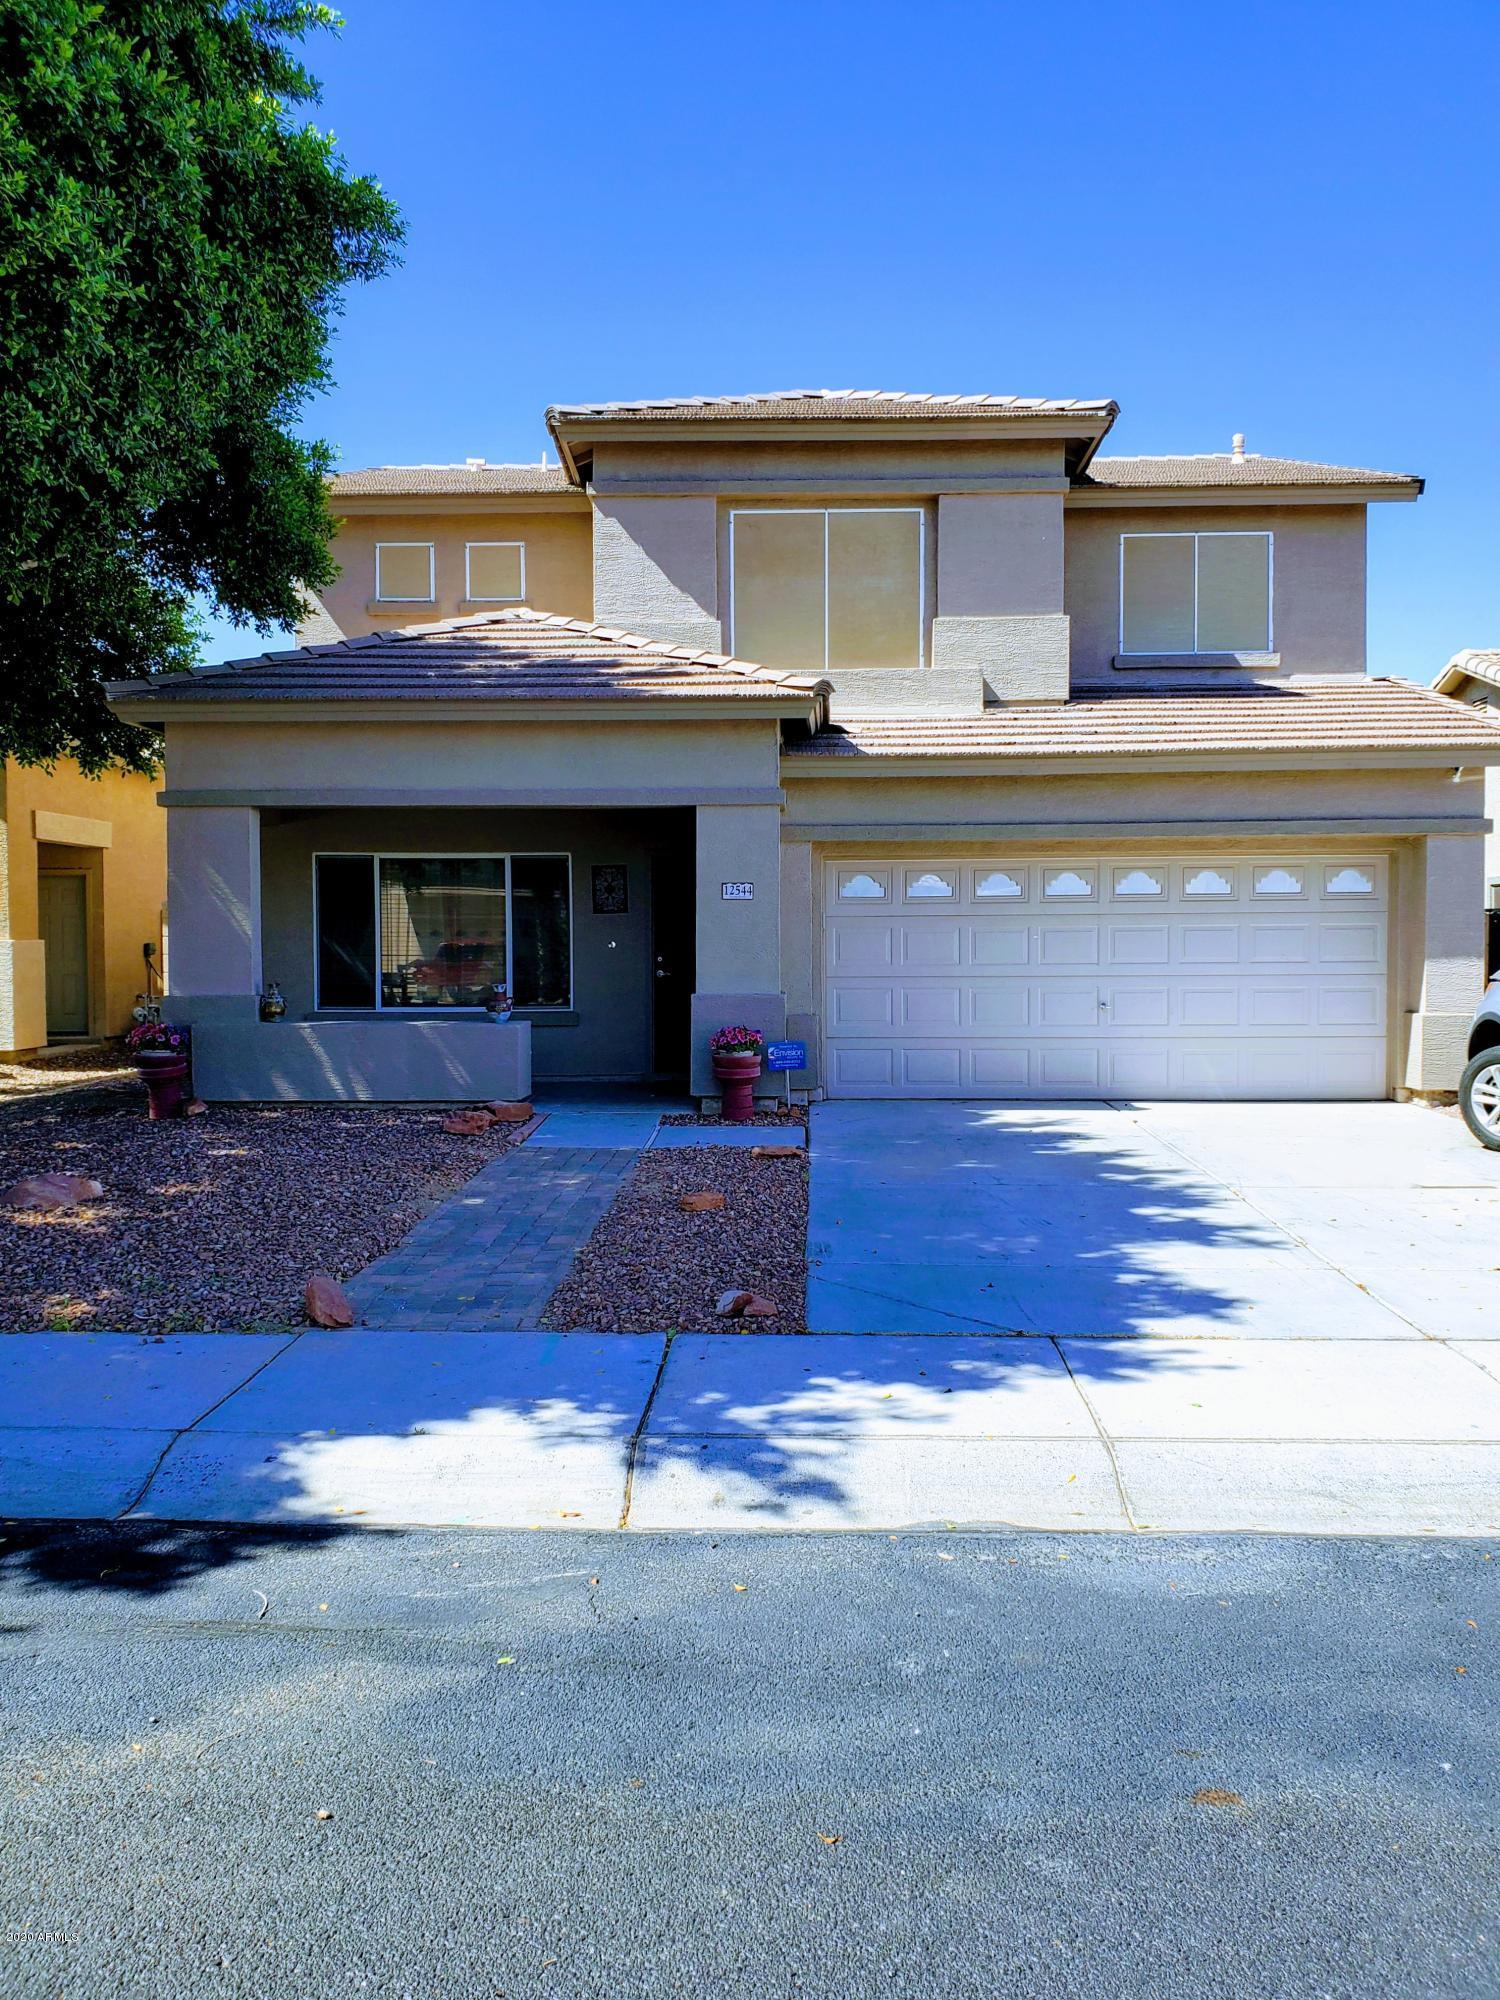 Photo of 12544 W ADAMS Street, Avondale, AZ 85323